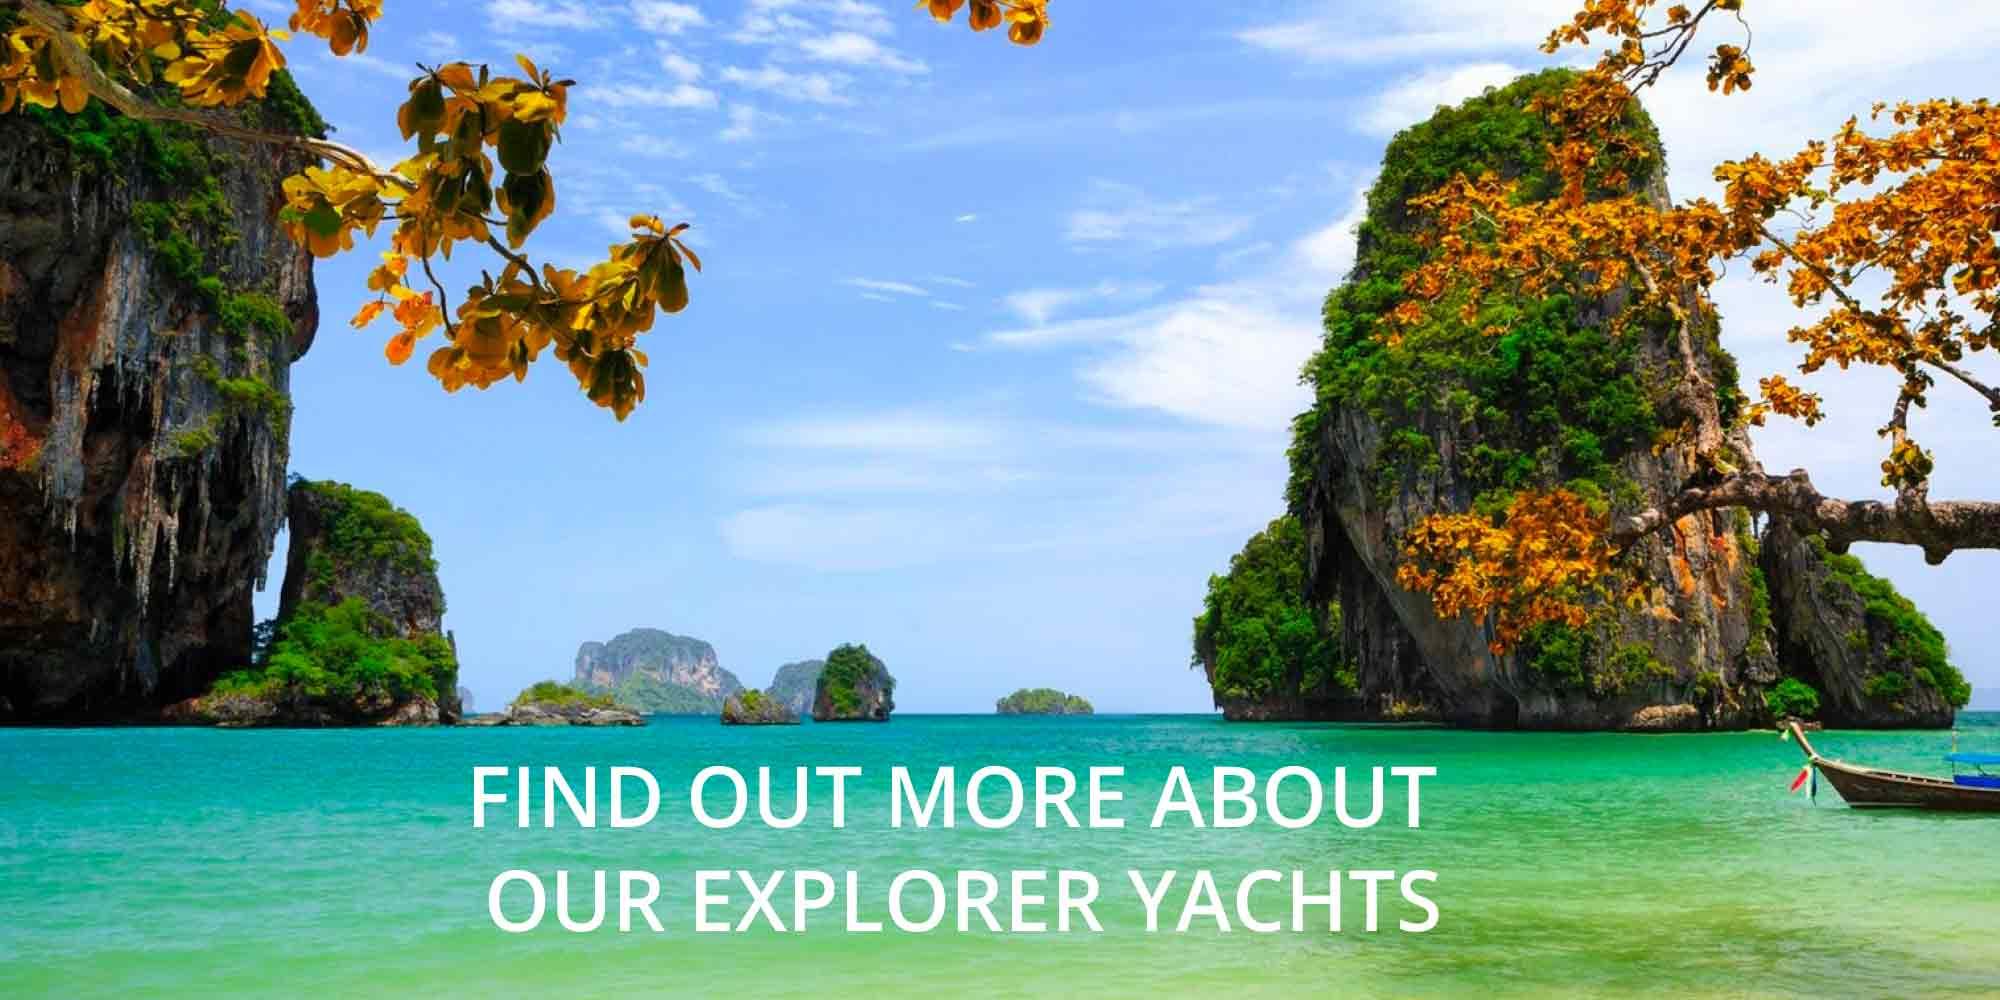 explorer yachts